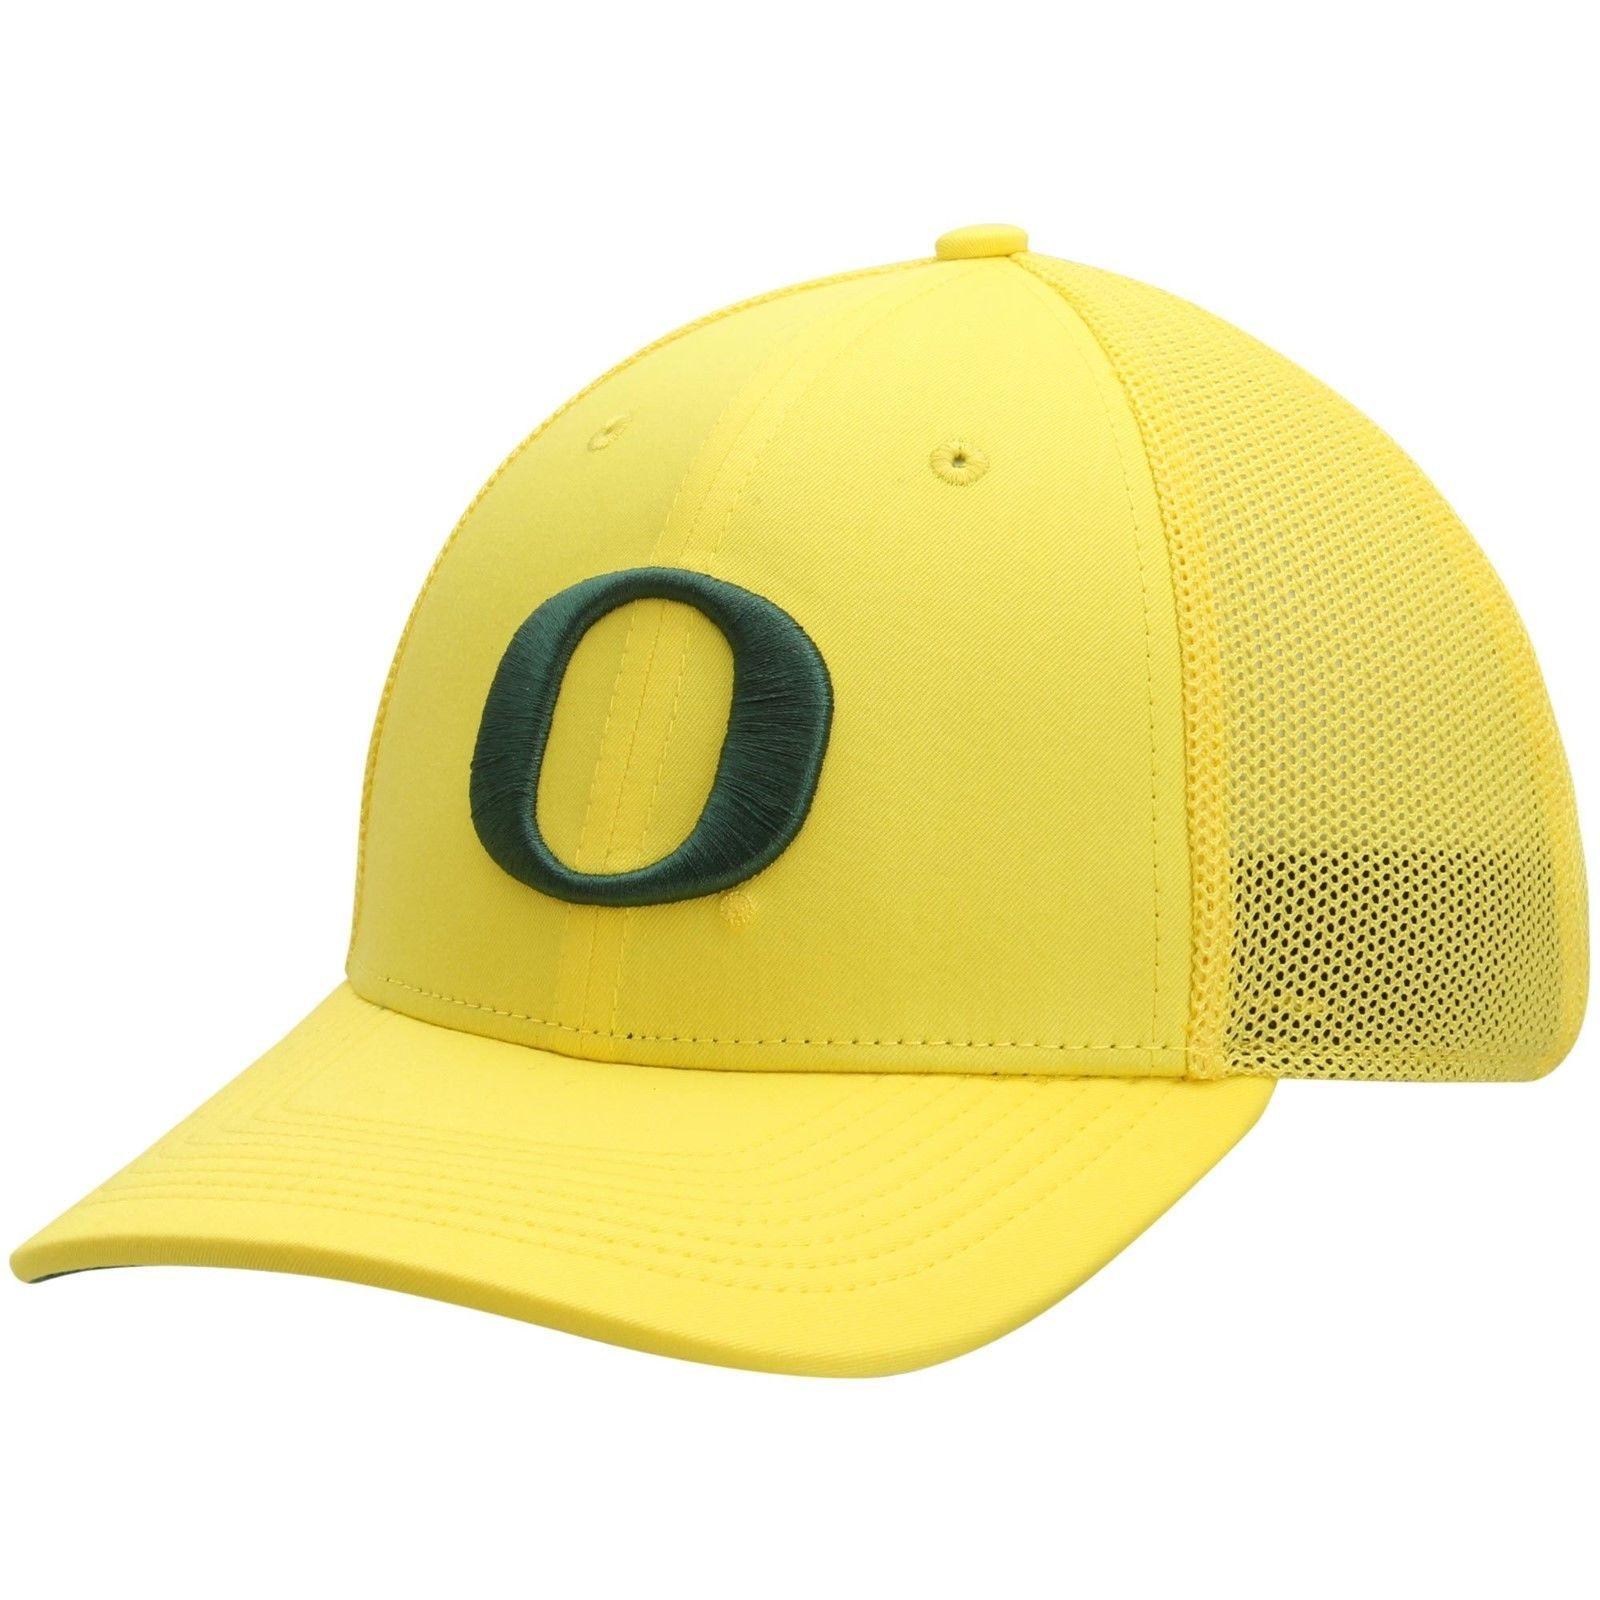 online store d375b eb151 NWT New Oregon Ducks Nike Dri-Fit Legacy91 Mesh Back Yellow Flex-Fit Hat